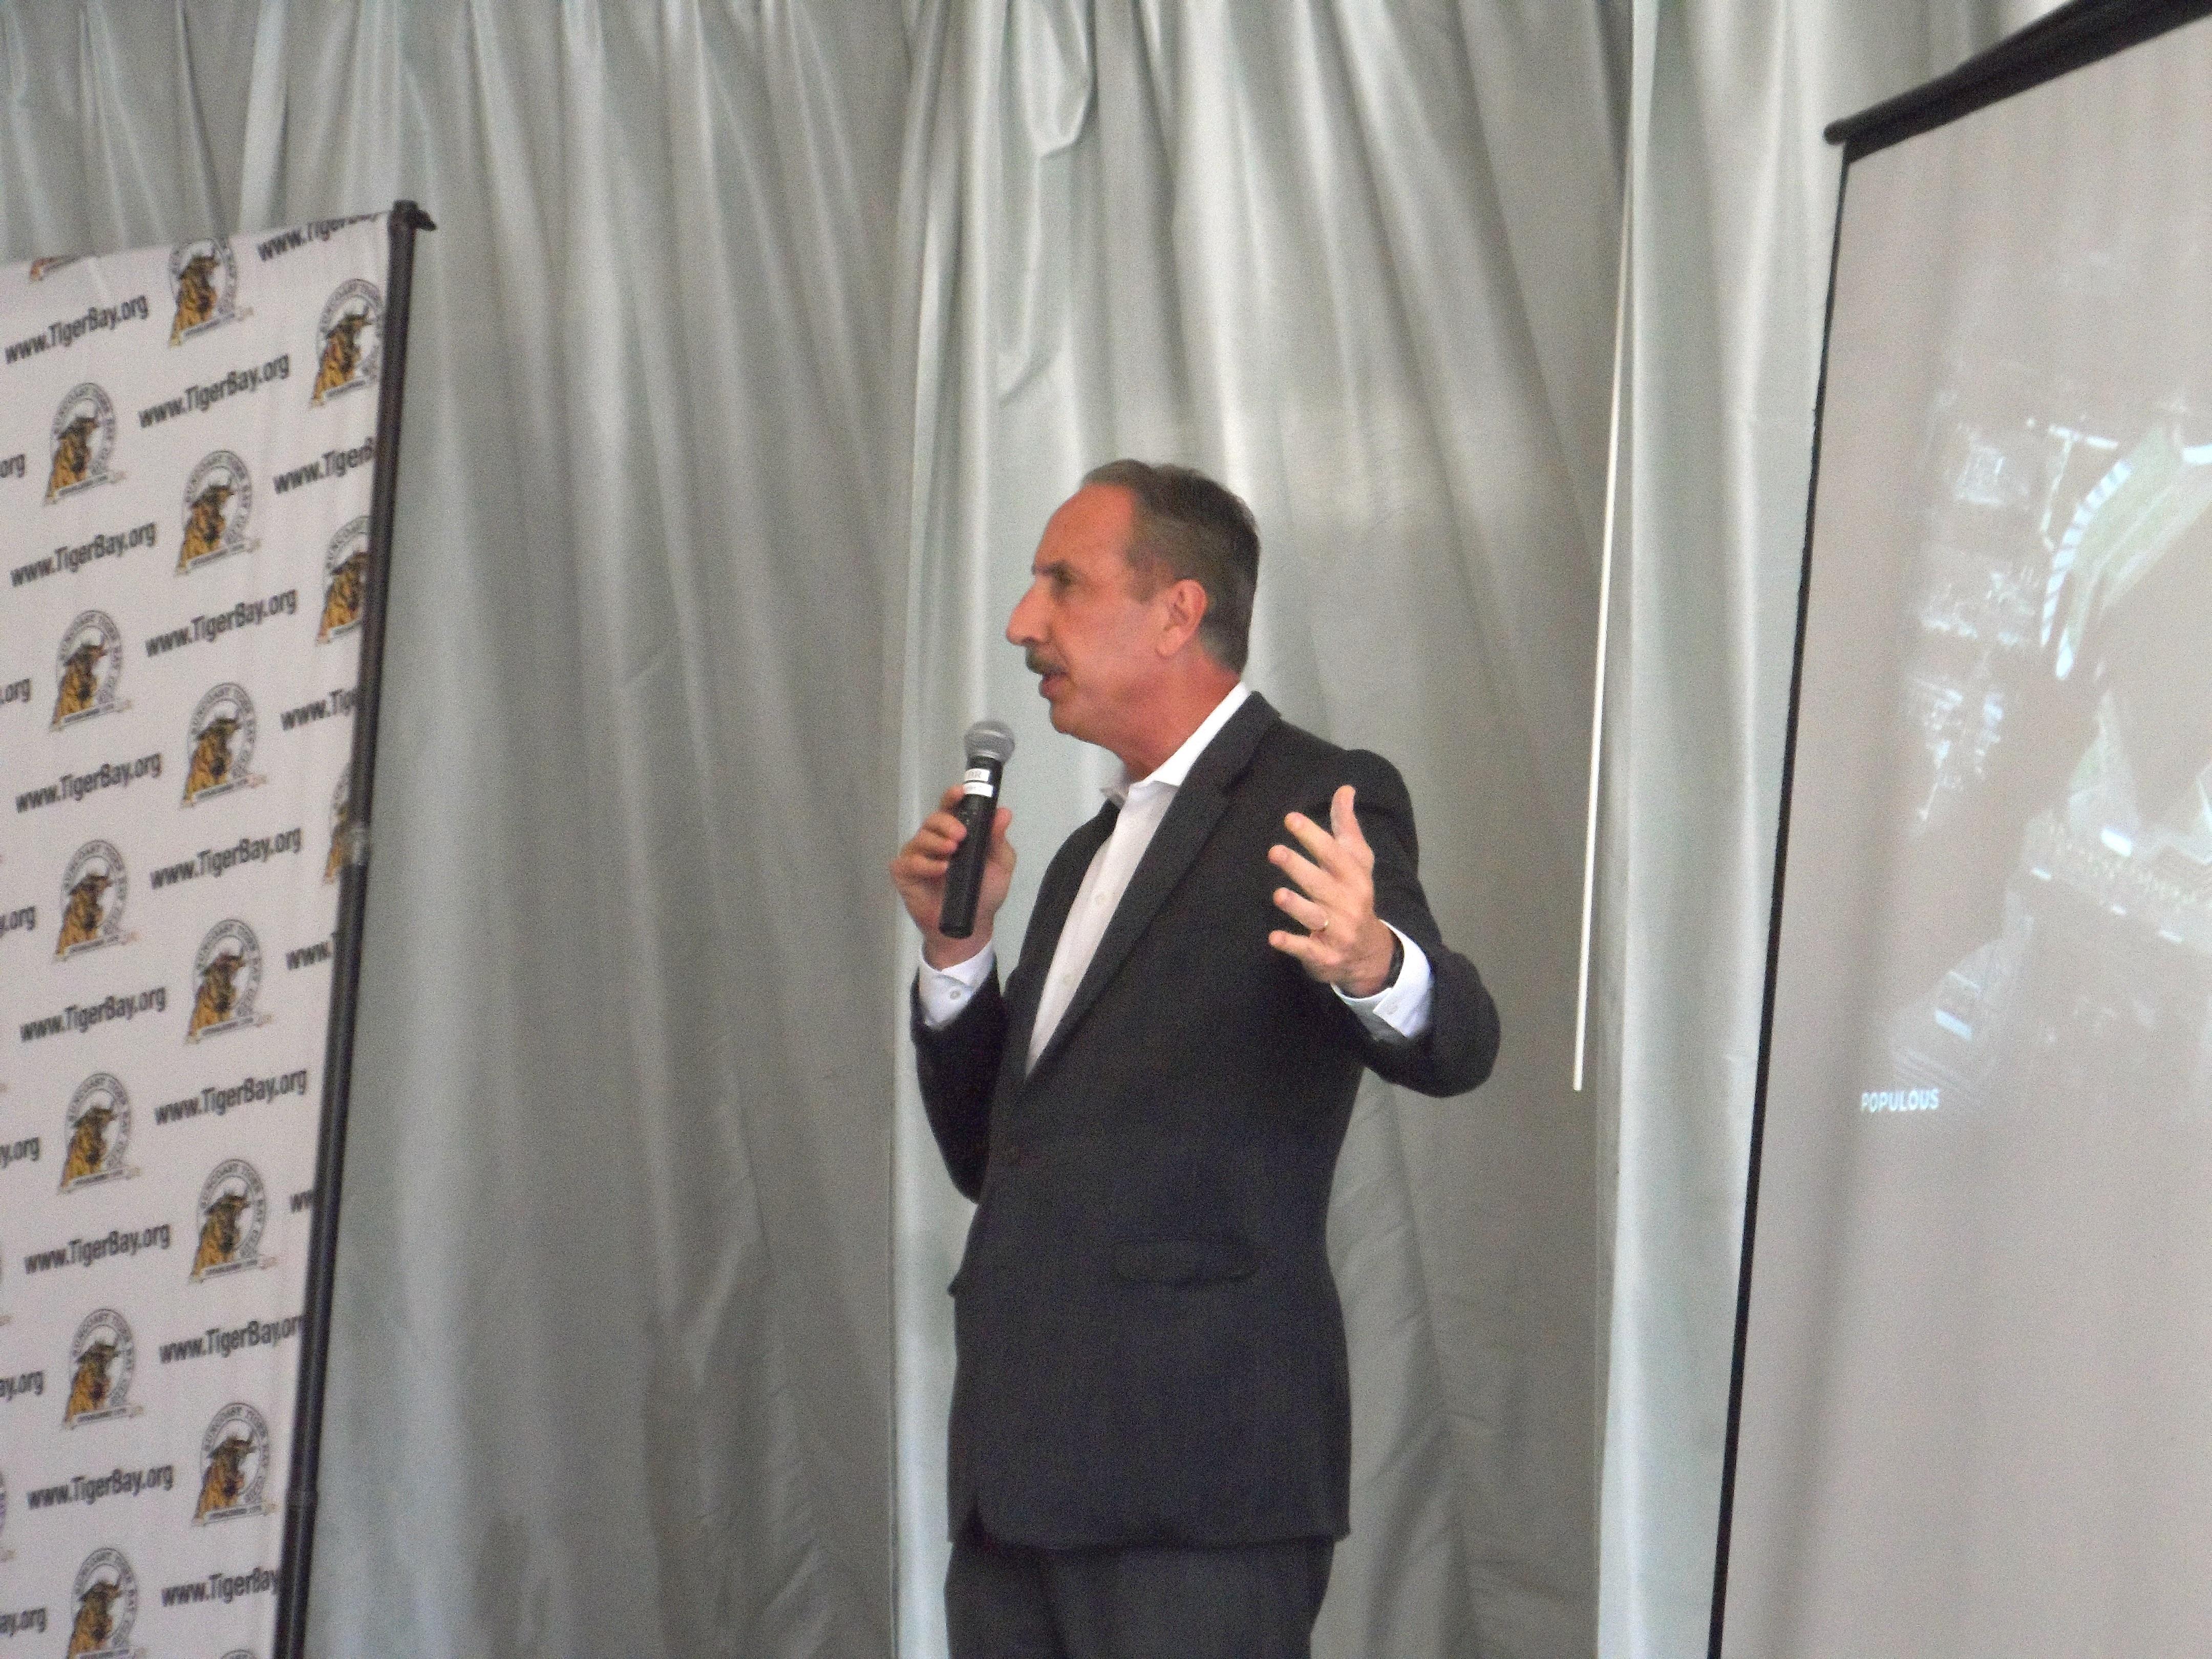 Former St. Petersburg Mayor Rick Baker on Tampa Bay Rowdies stadium referendum